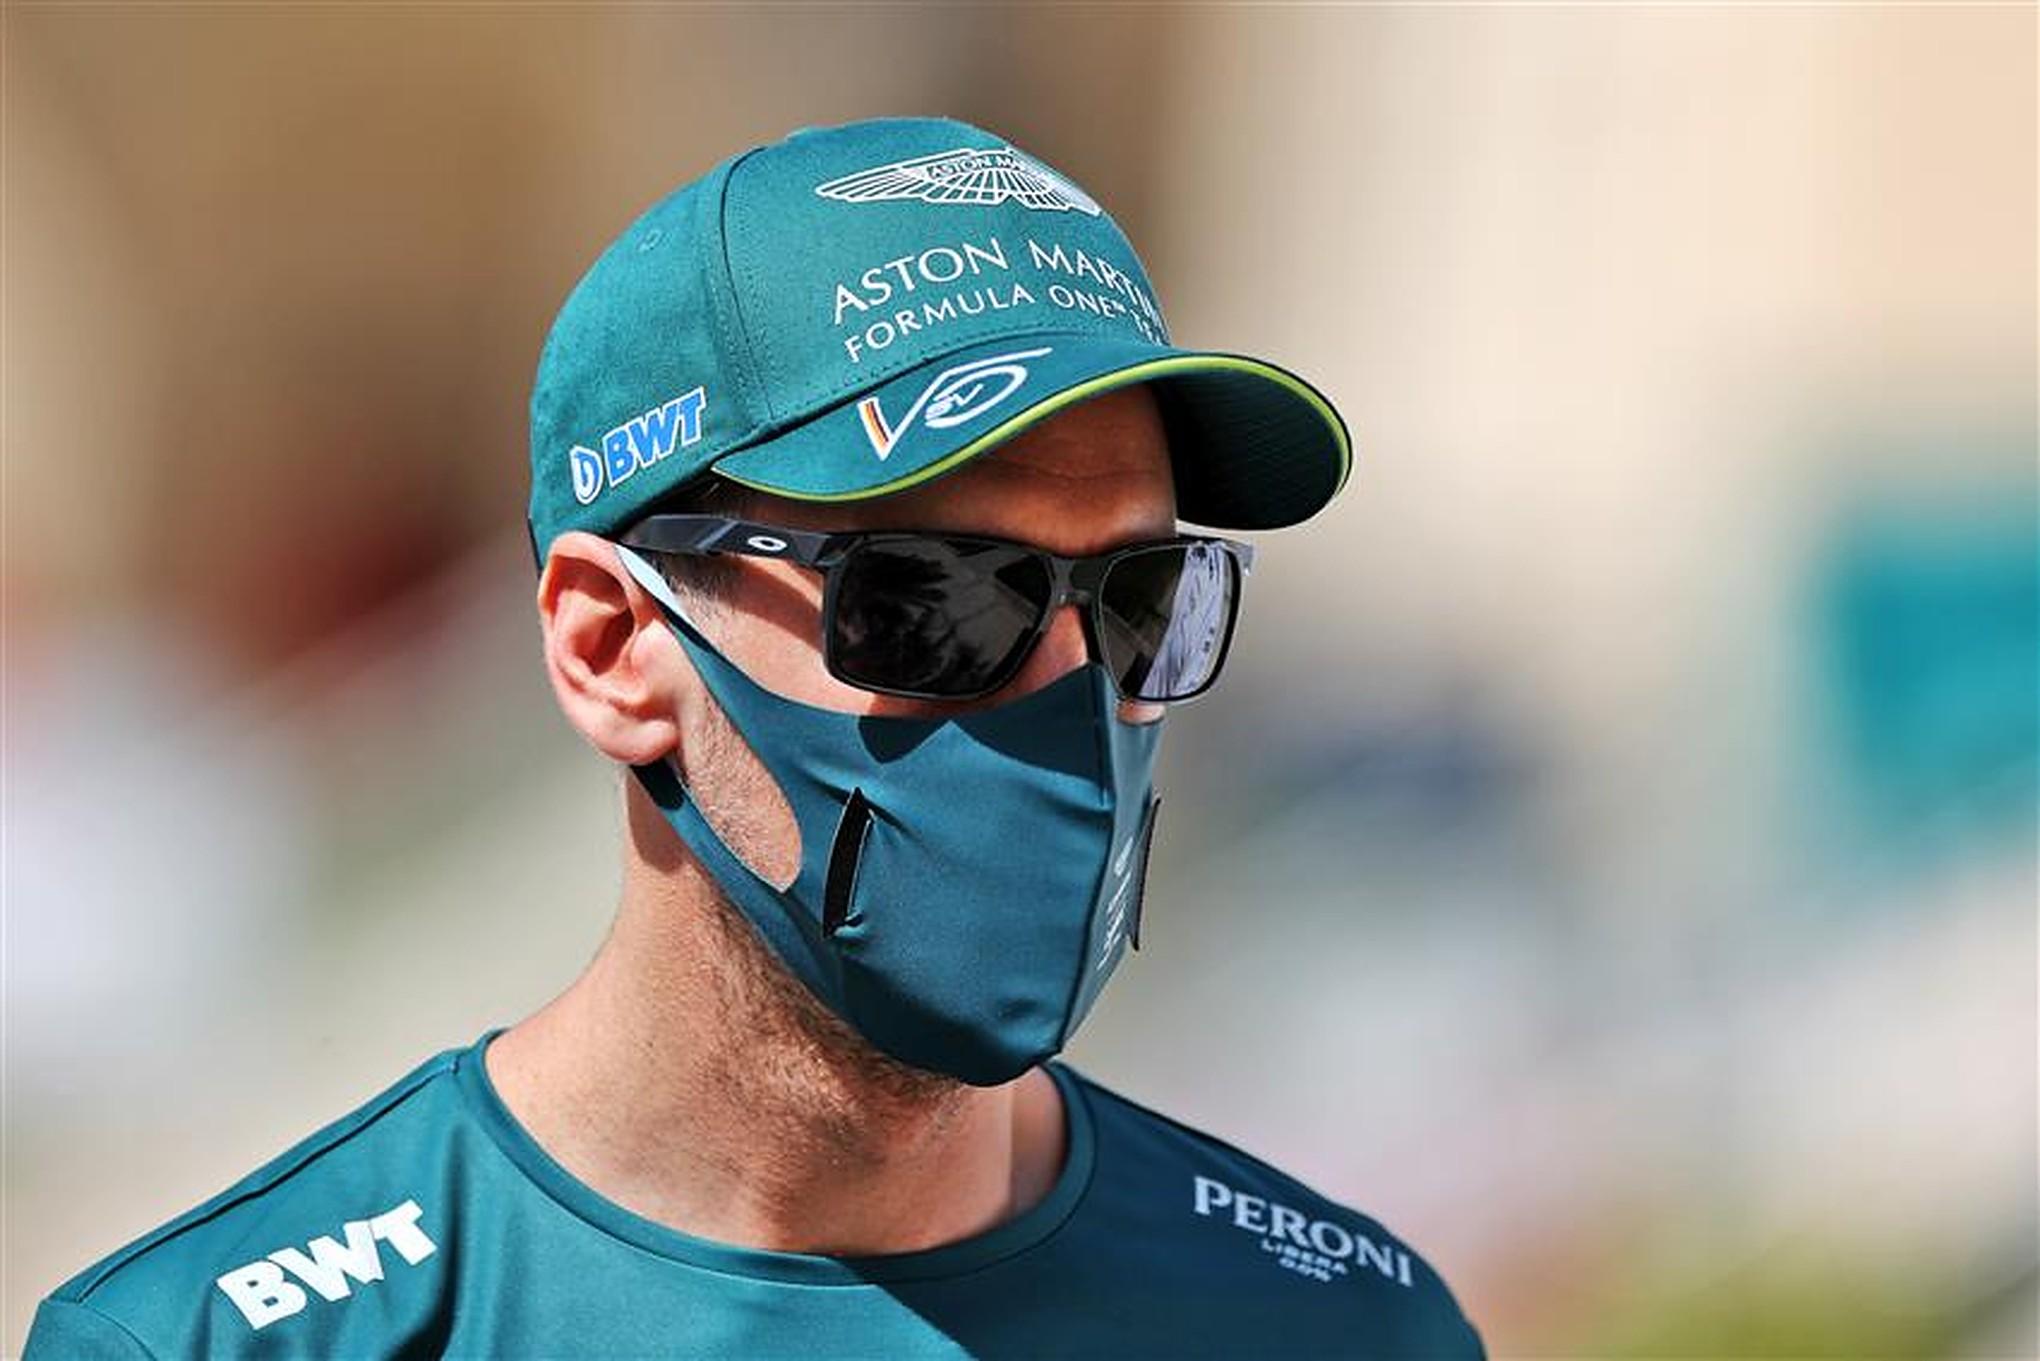 Aston Martin F1 driver Sebastian Vettel - Formula1news.co.uk